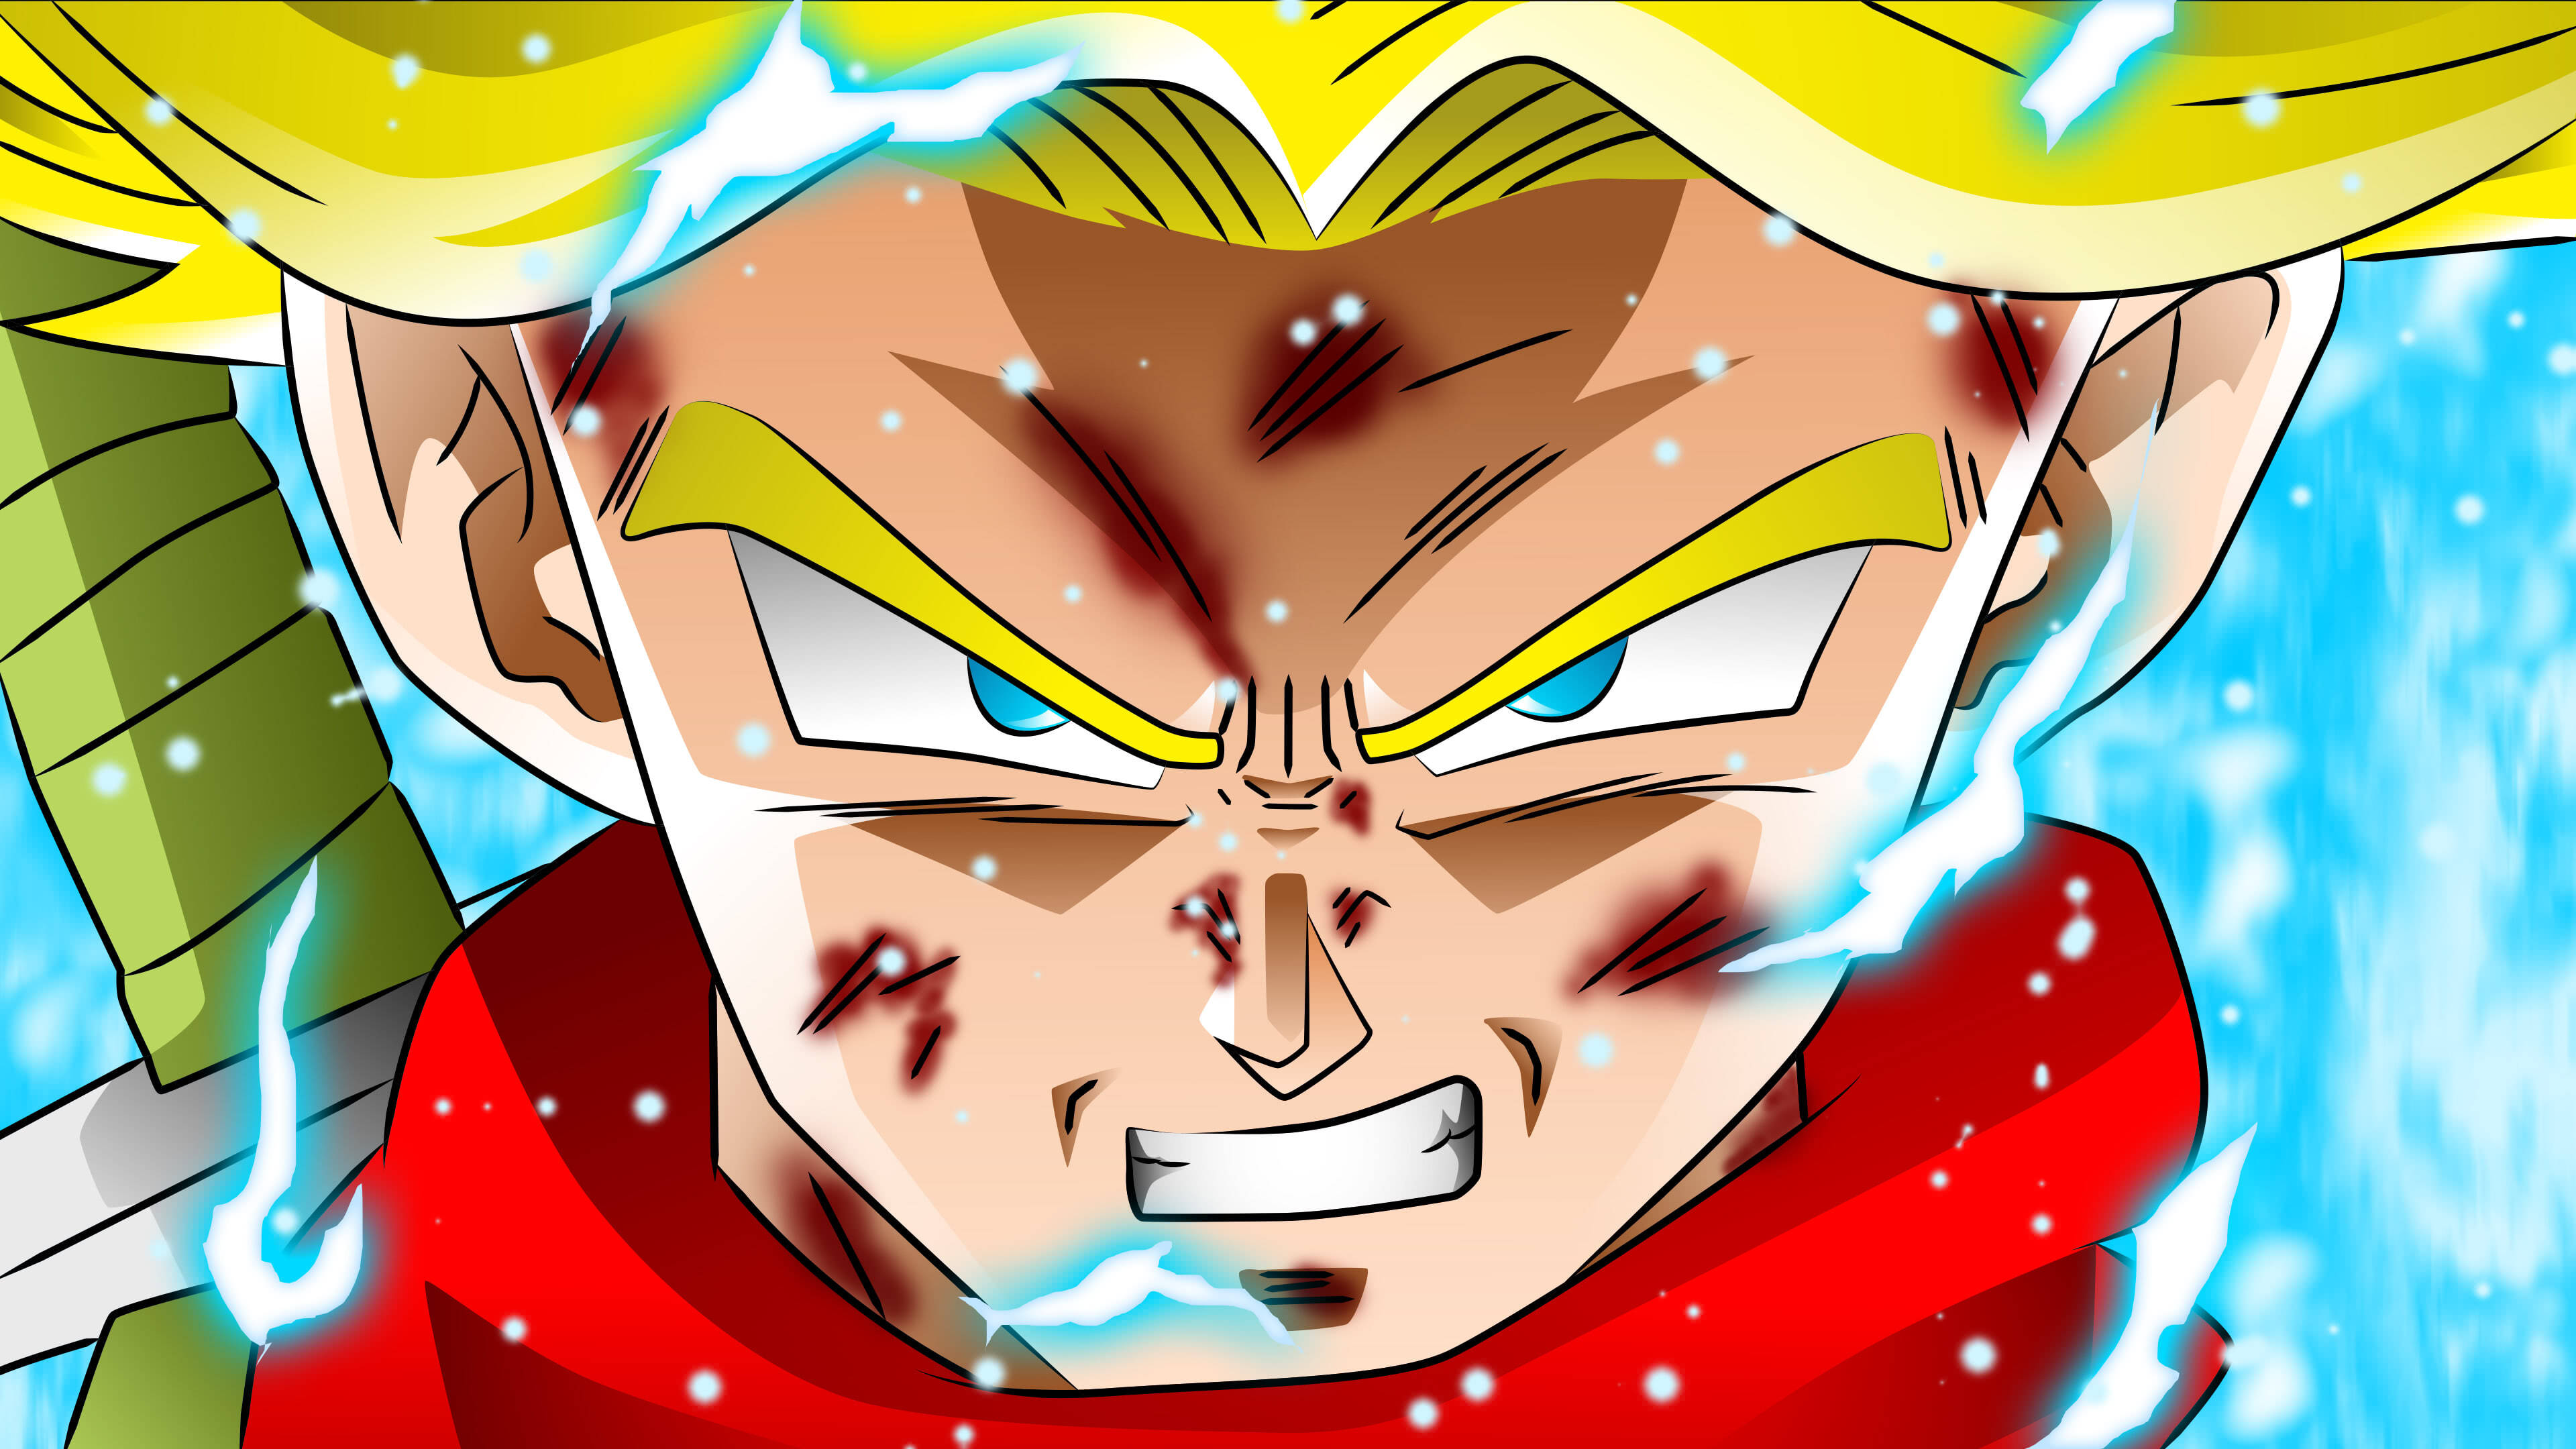 Dragon Ball Future Trunks Portrait Uhd 4k Wallpaper Pixelz